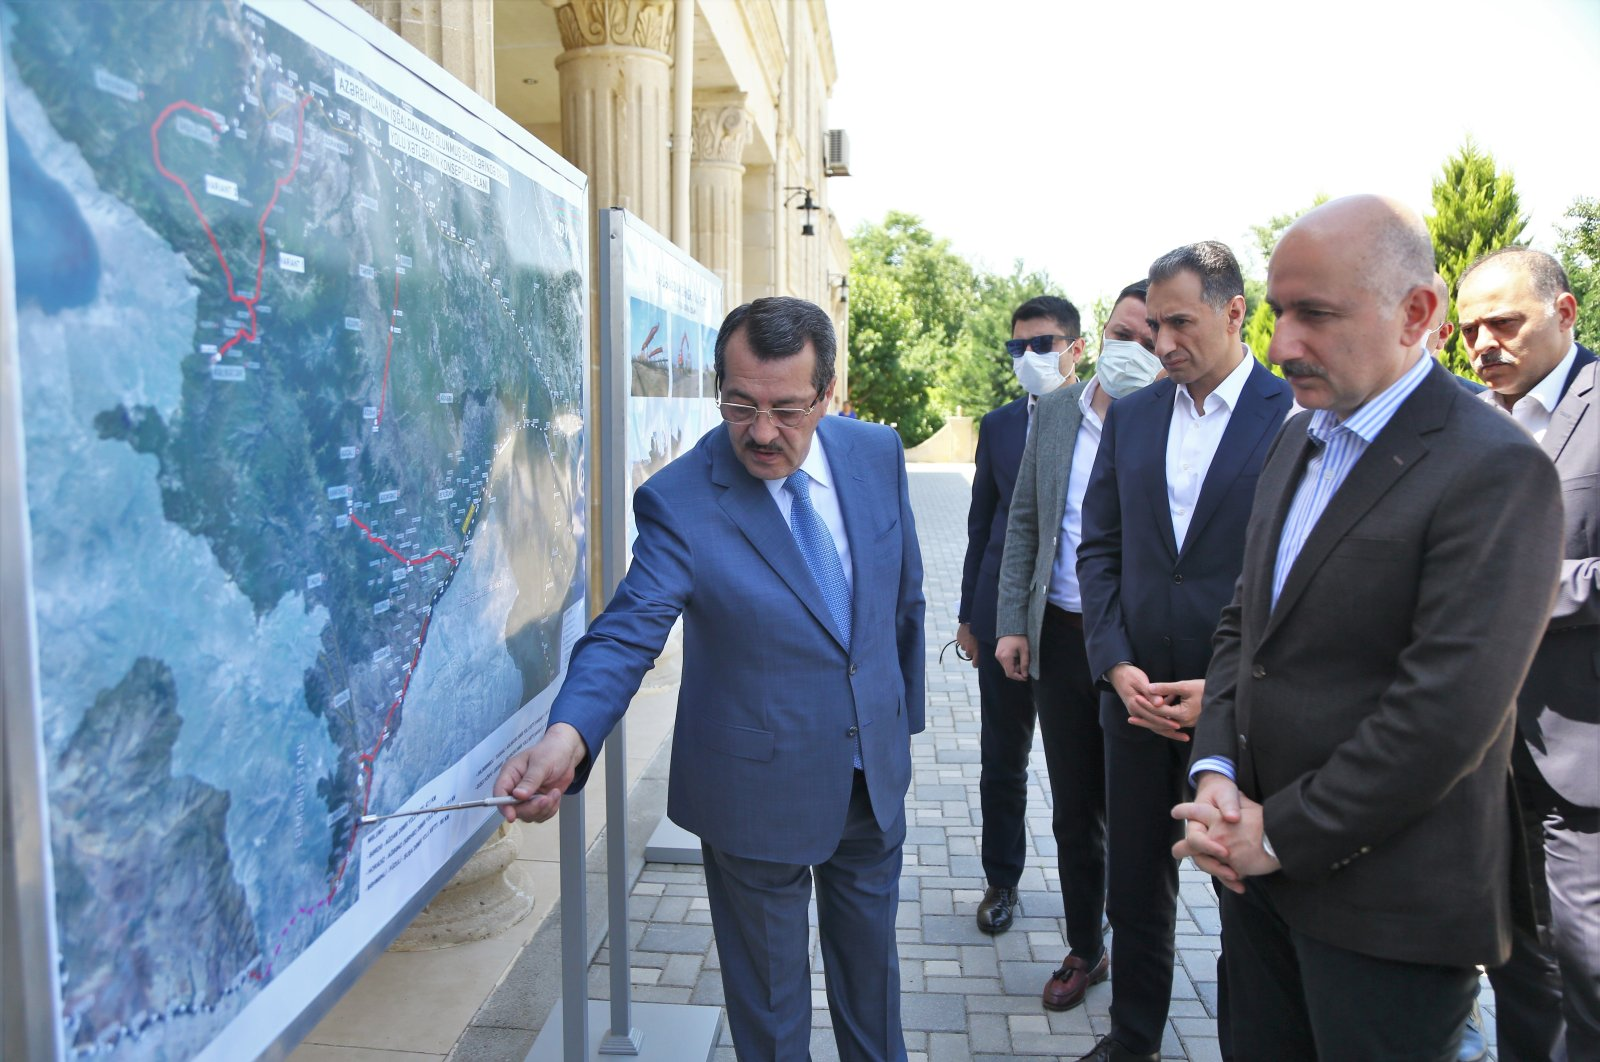 Transport and Infrastructure Minister Adil Karaismailoğlu together with his Azerbaijani counterpart Rashad Nabiyev in Baku, Azerbaijan, May 31, 2021. (AA Photo)